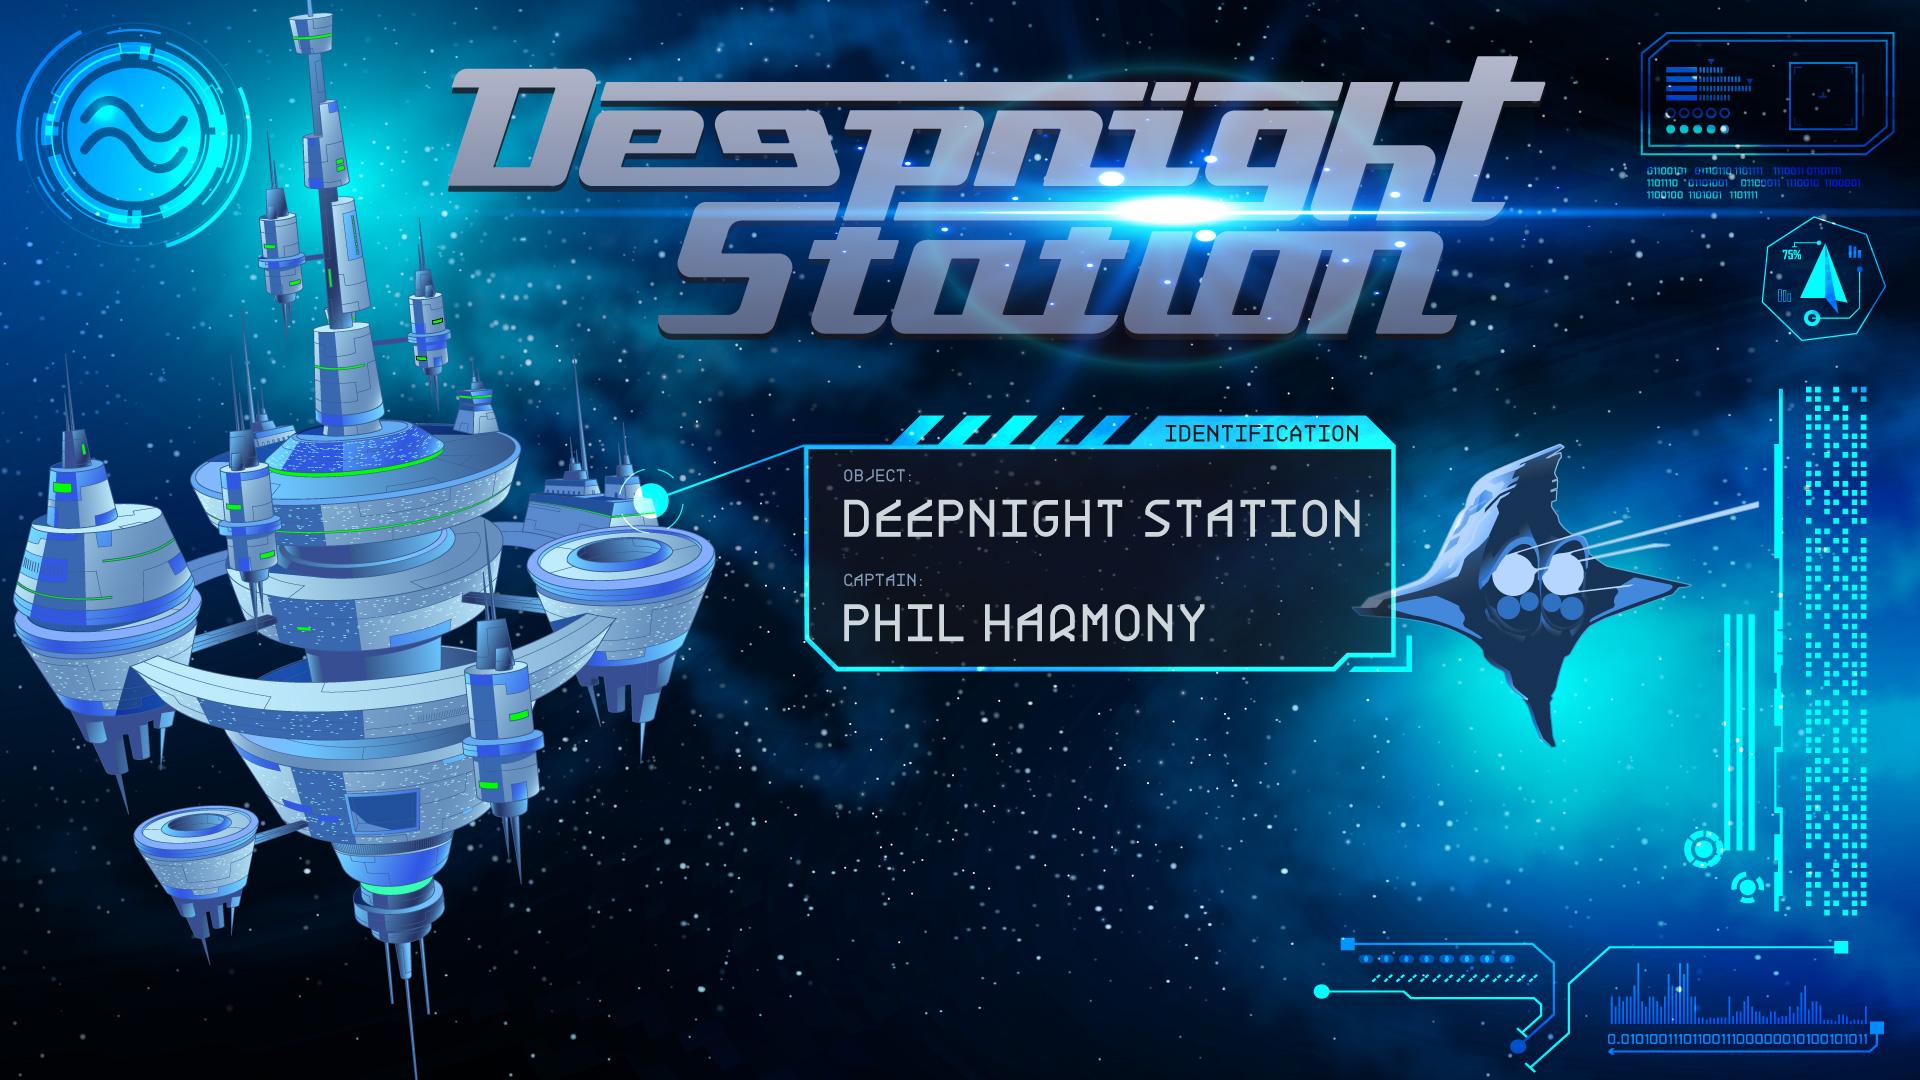 DEEPNIGHT STATION mit PHIL HARMONY